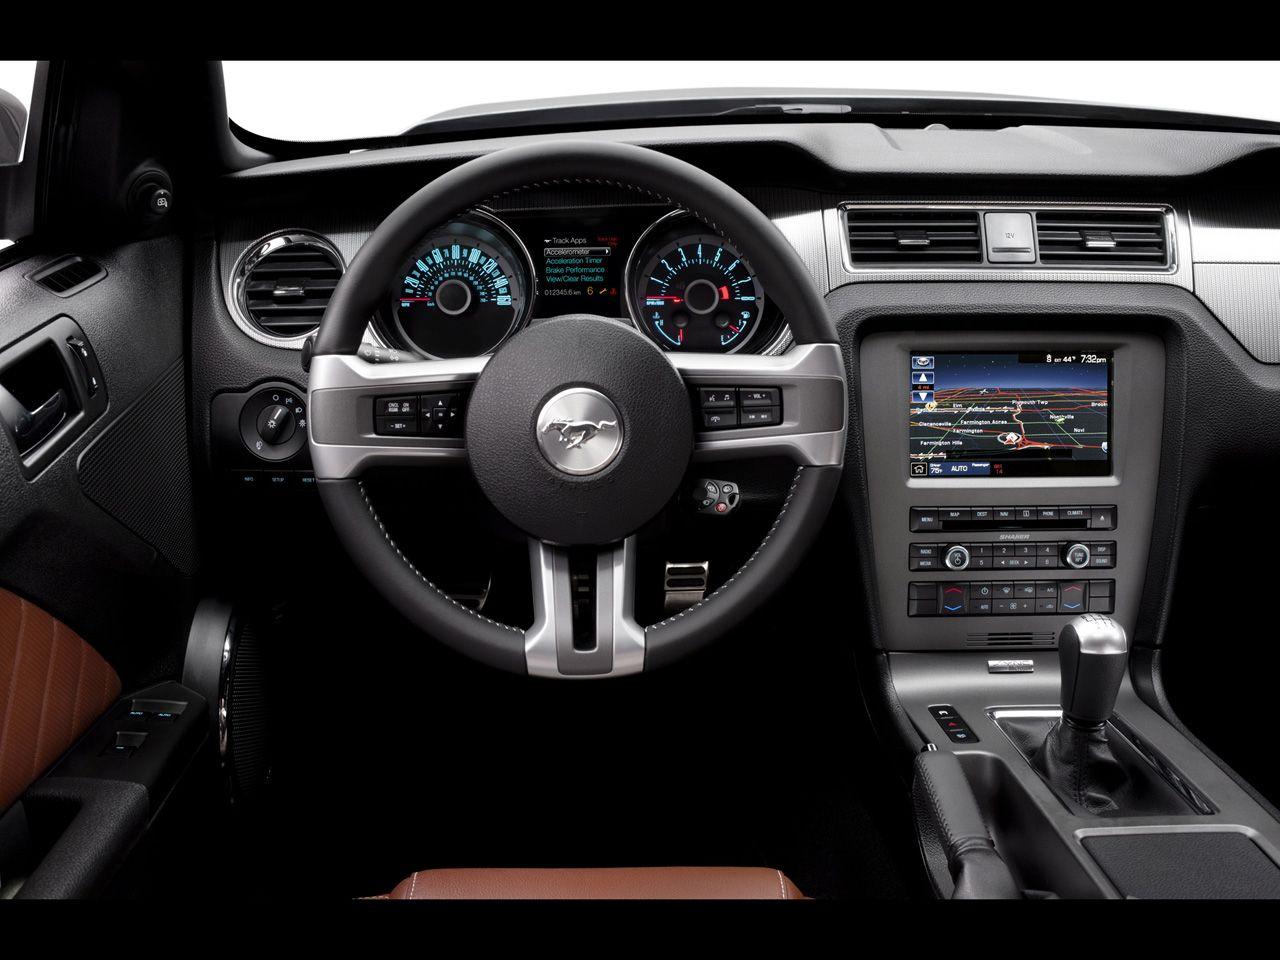 2013 Ford Mustang Dashboard Interior Mustang Interior Mustang